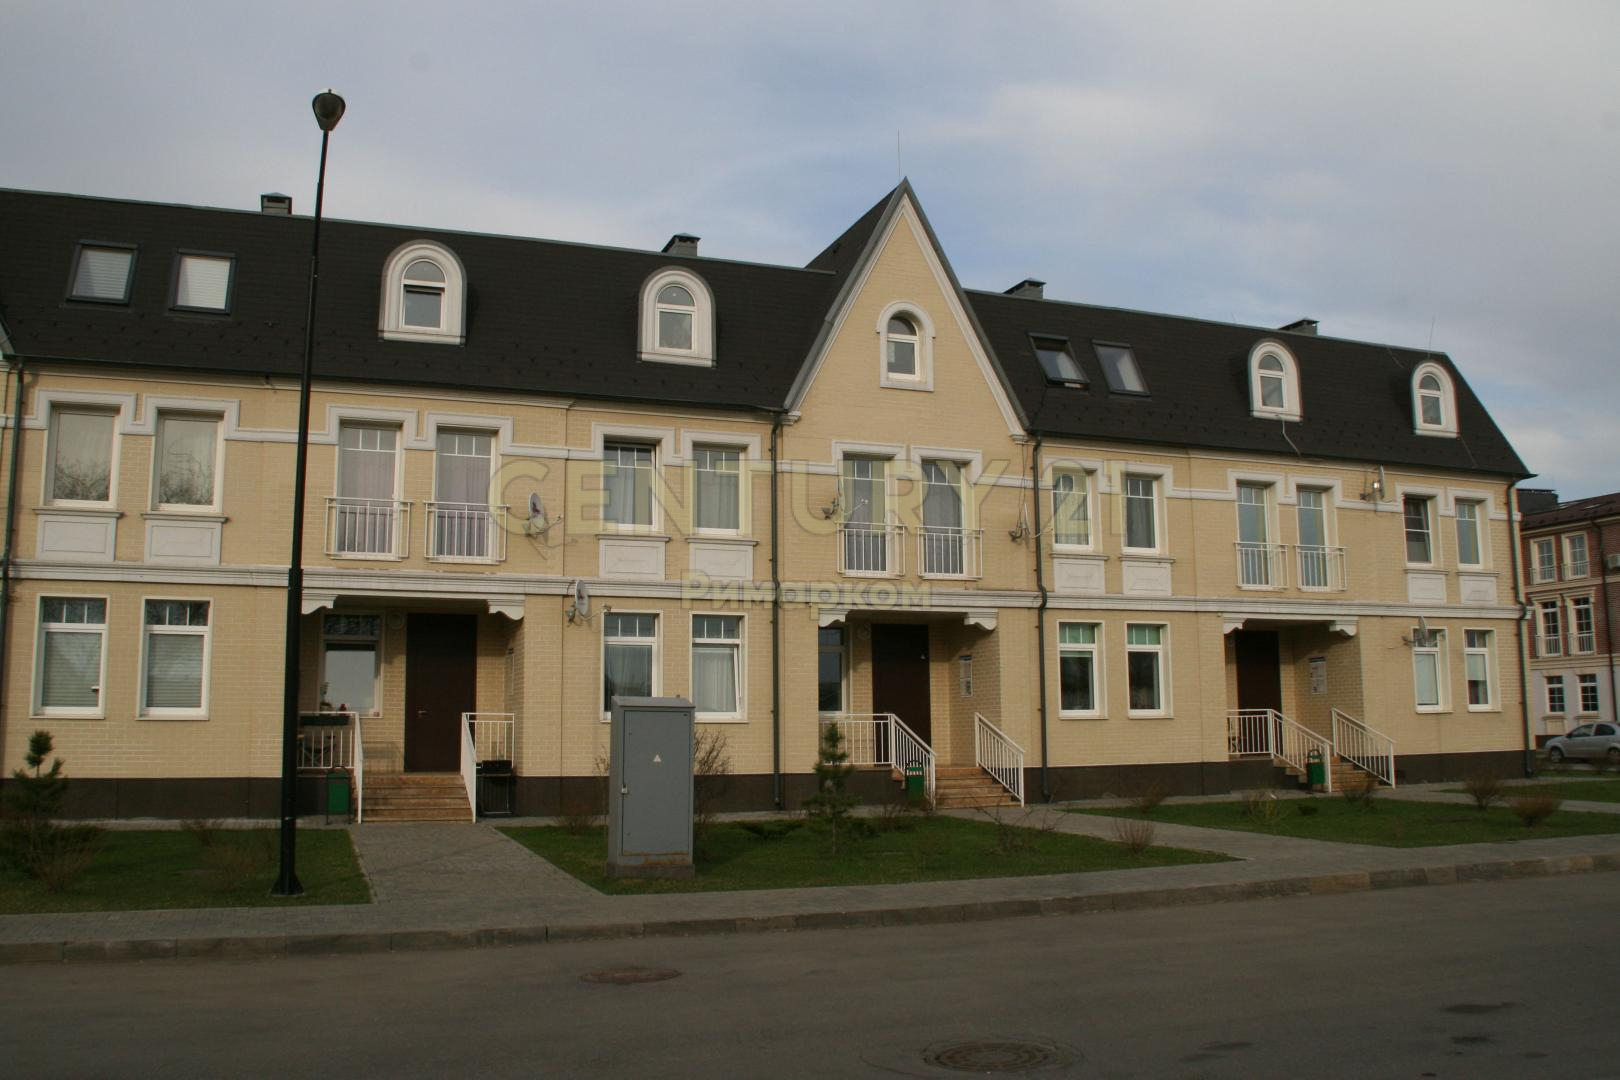 Продается трехкомнатная квартира за 9 200 000 рублей. Троицк, 1-я Изумрудная улица, 12.